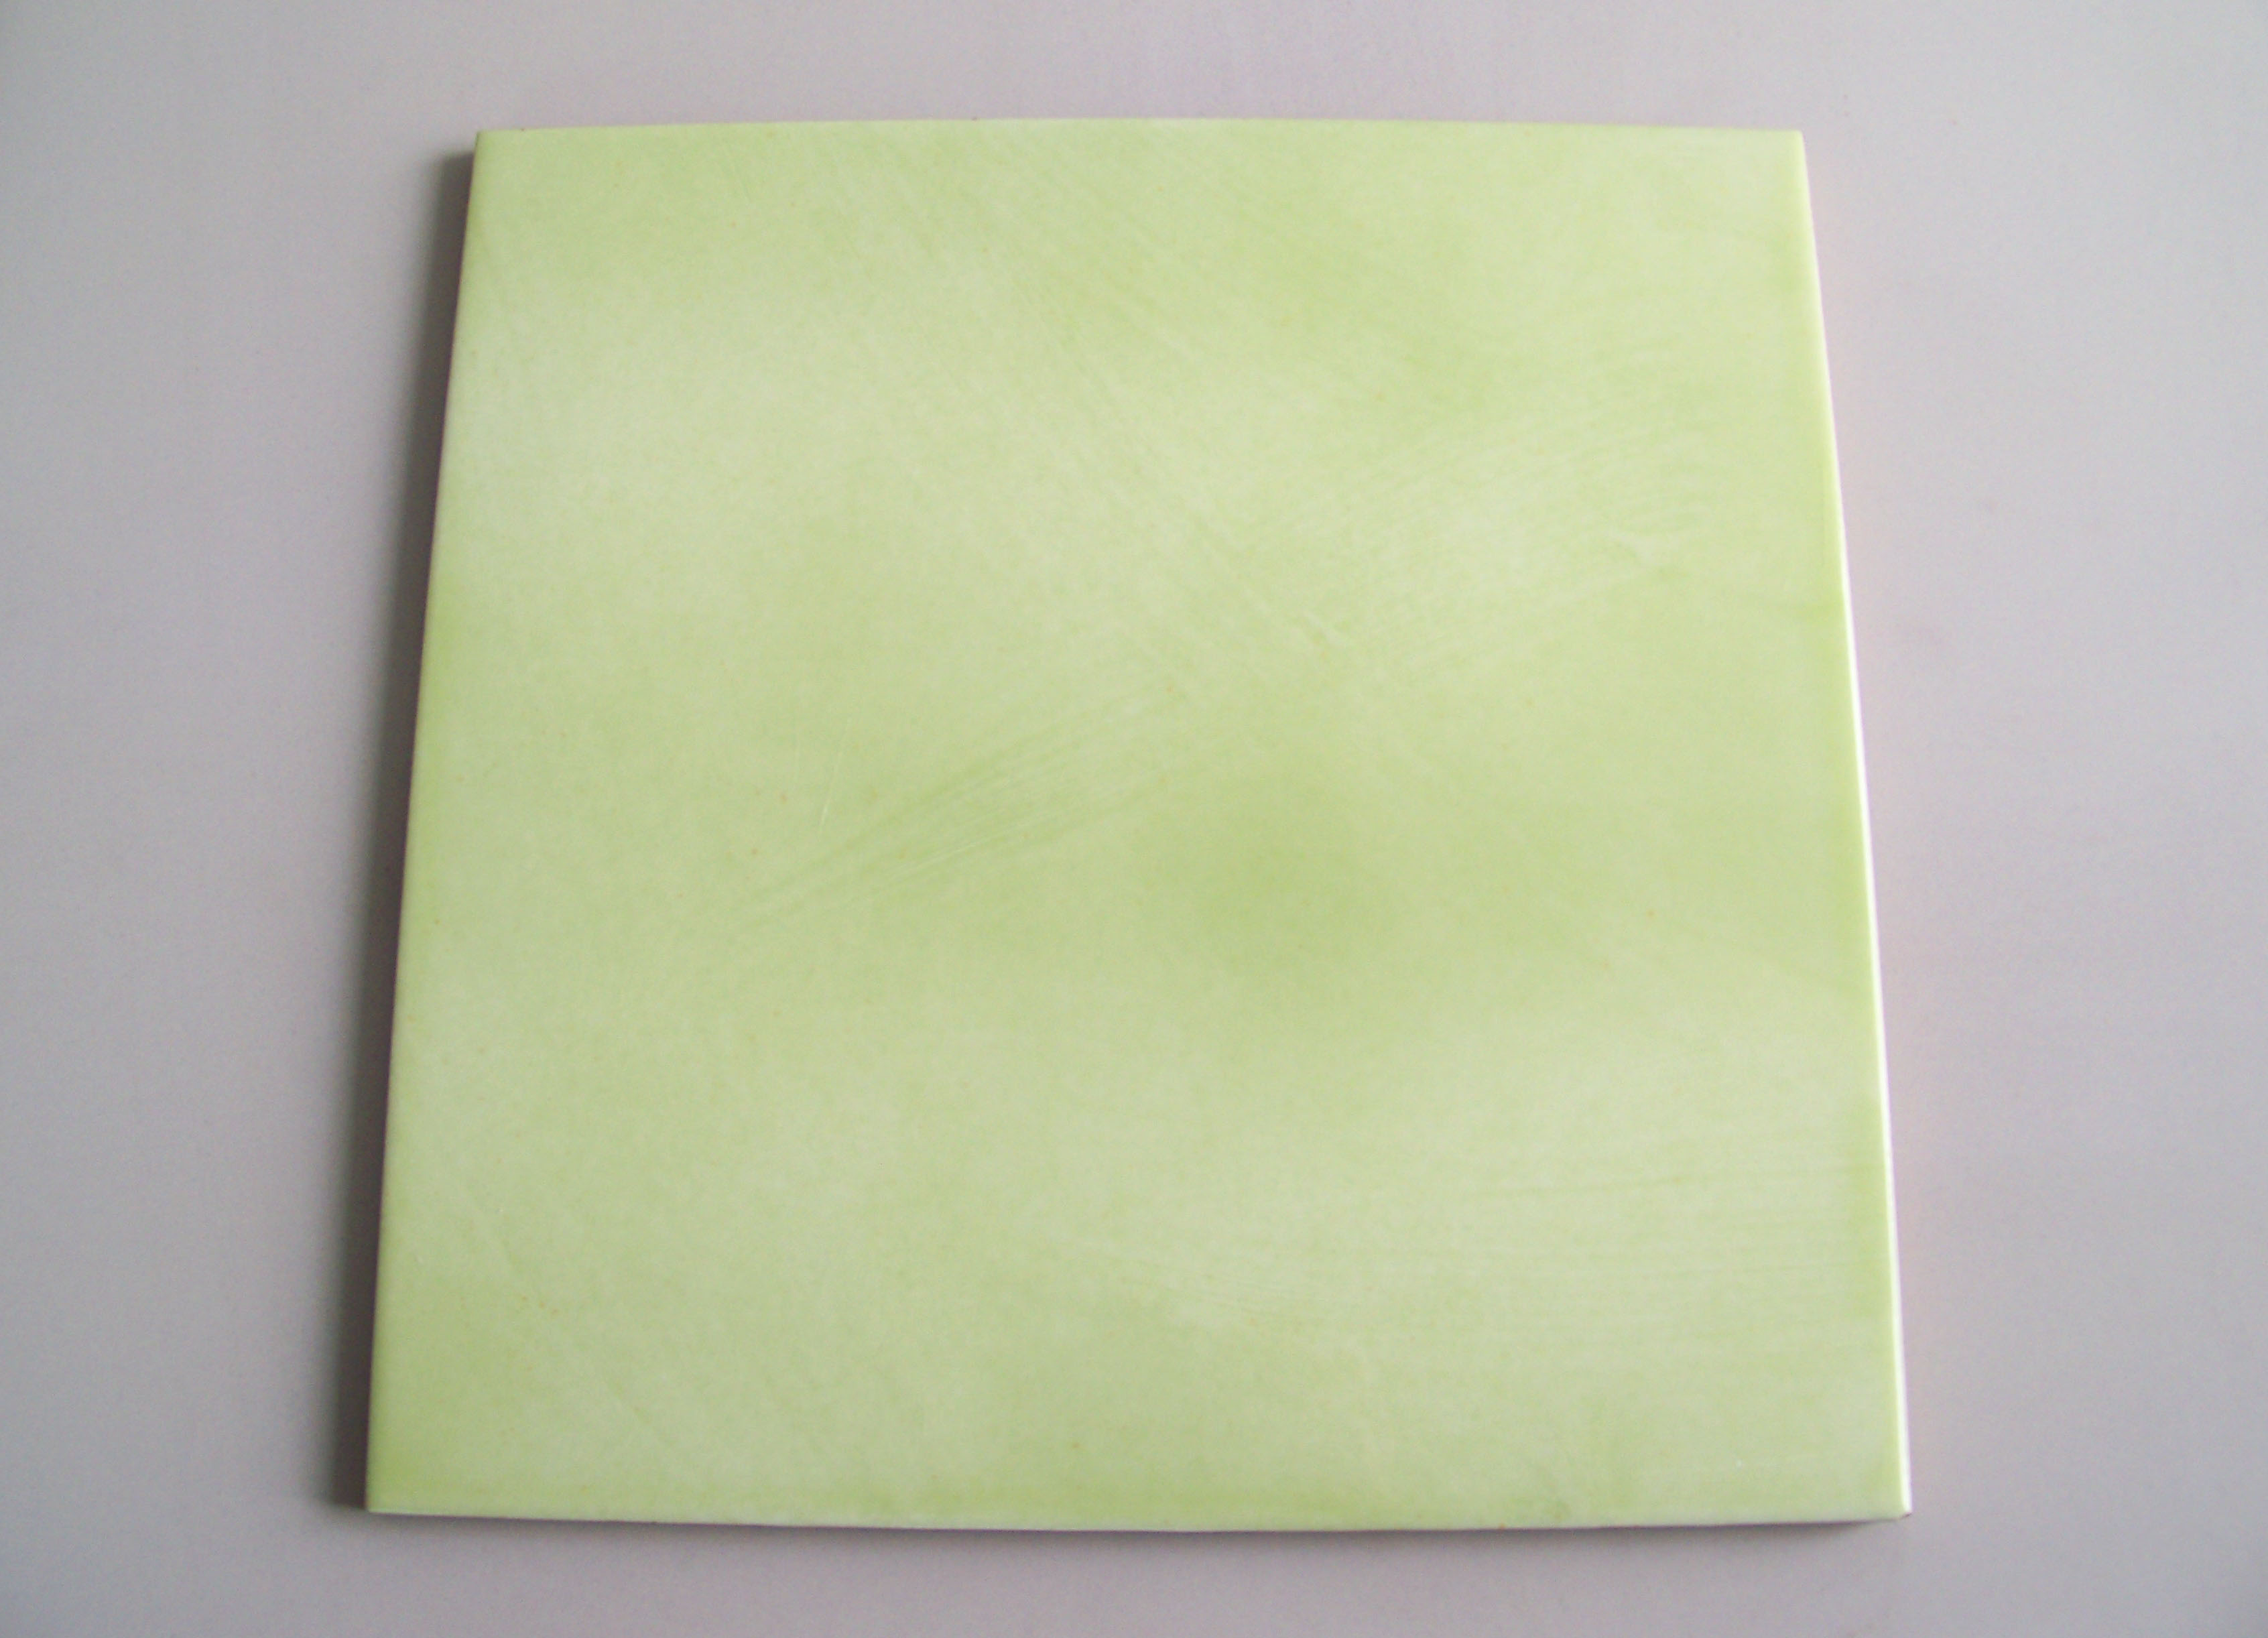 Decoratori bassanesi verde mela scuro lucido u mq u mavic